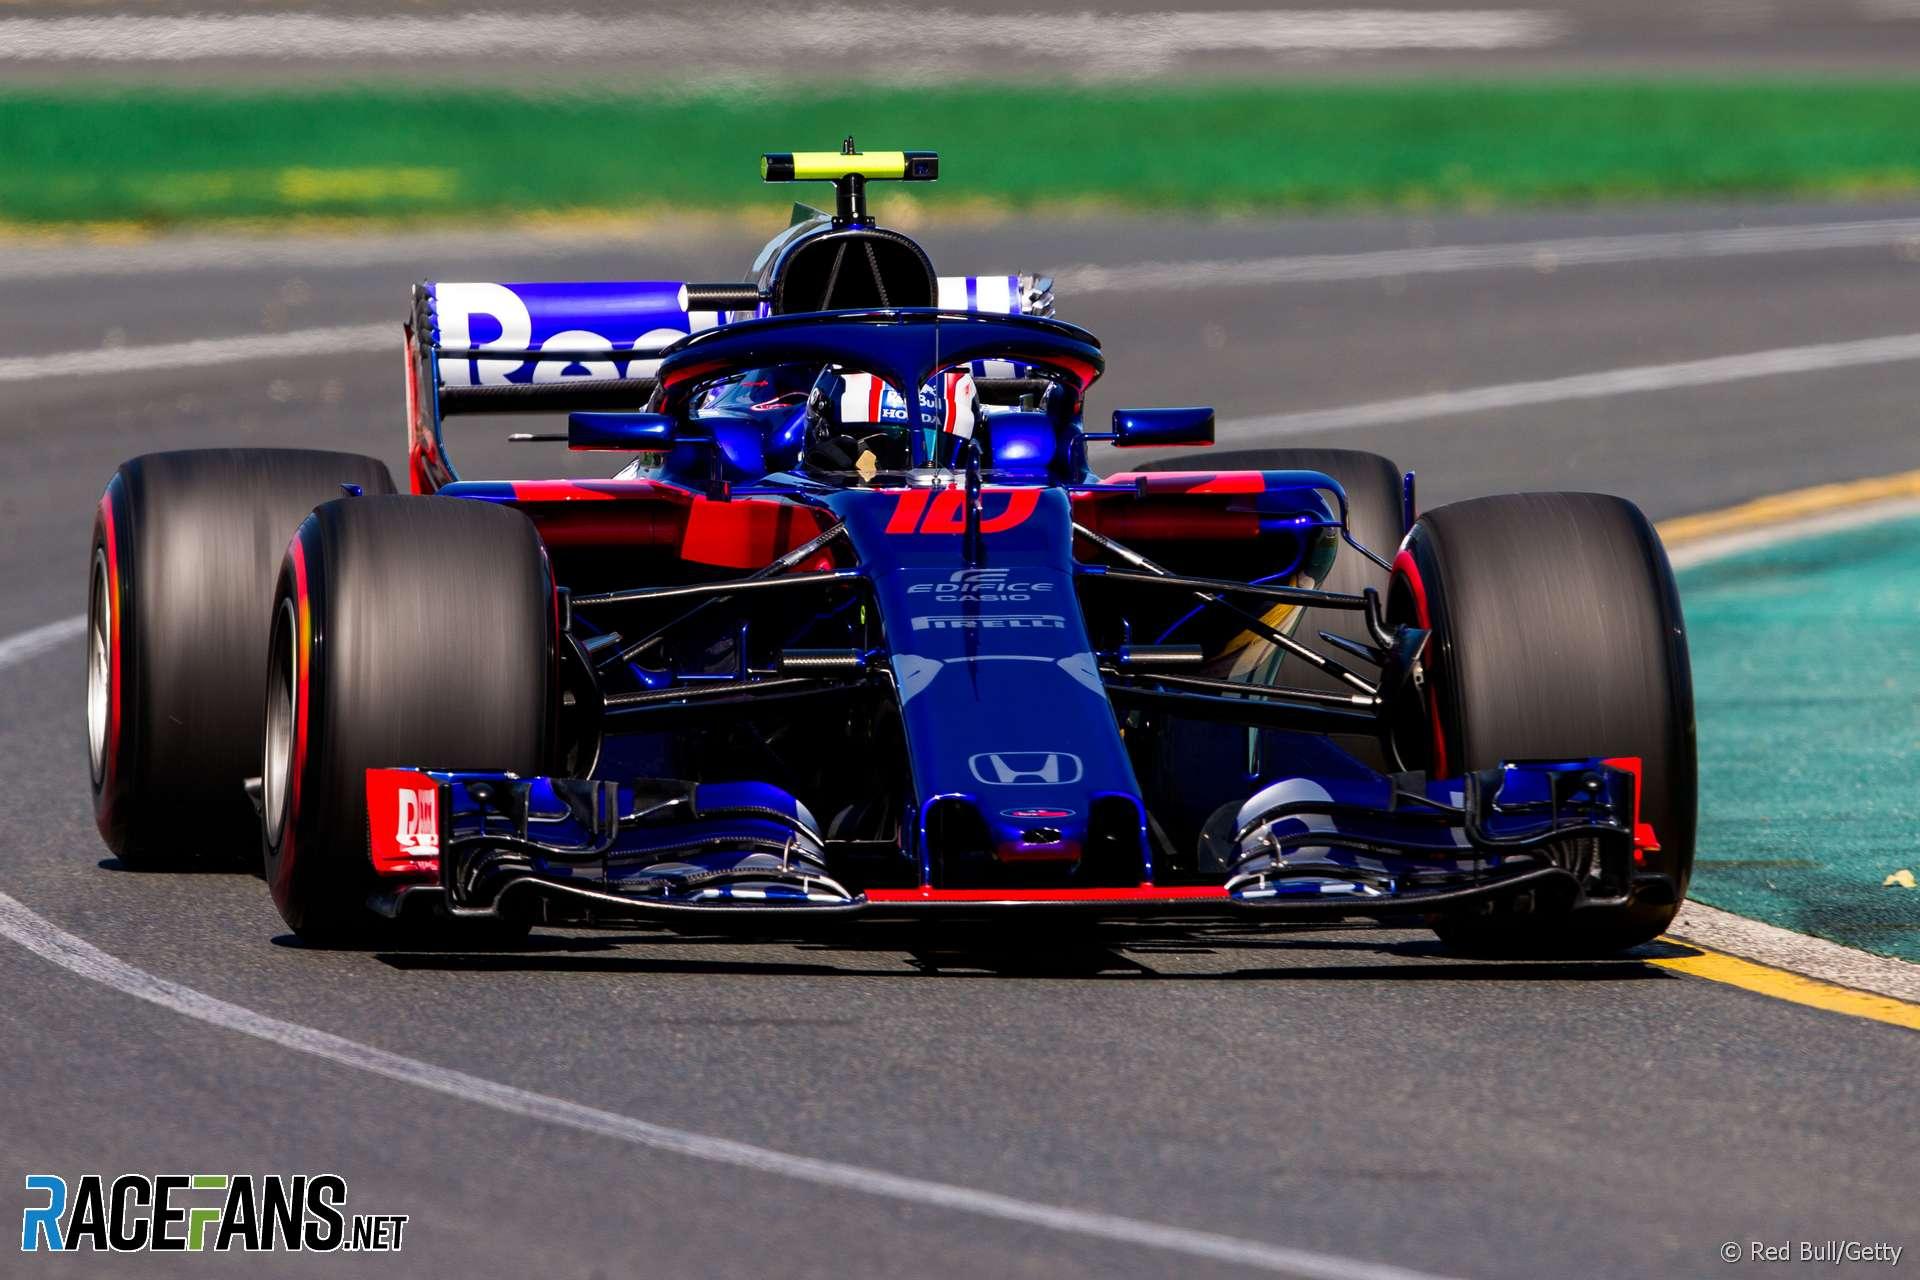 Pierre Gasly, Toro Rosso, Albert Park, 2018